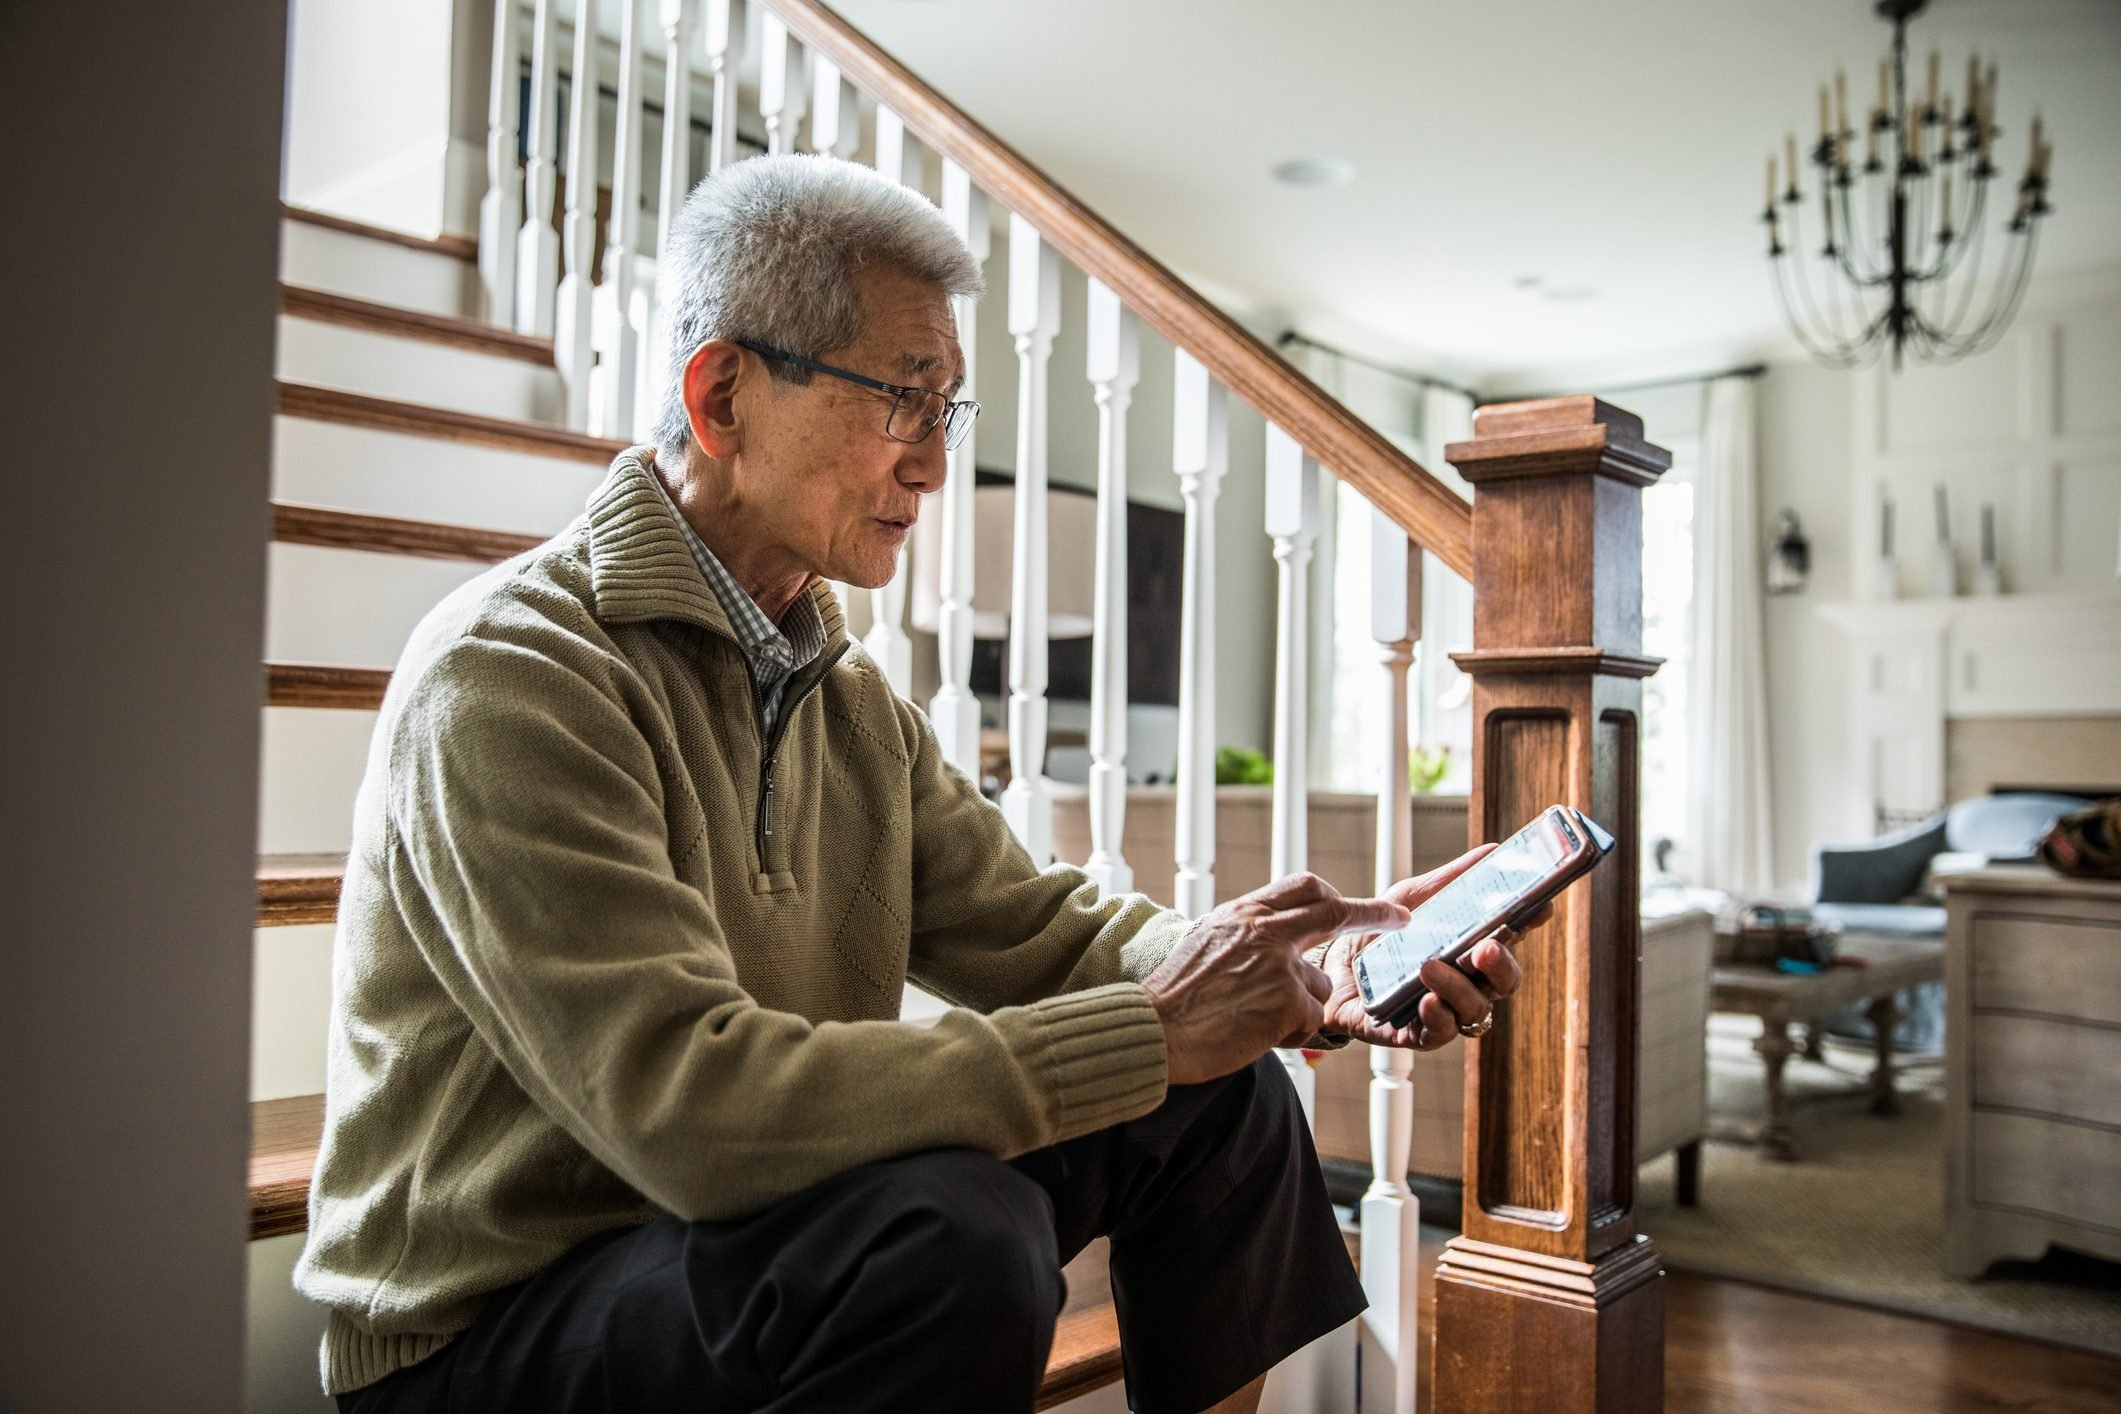 Senior man listening to music on laptop wearing headphones